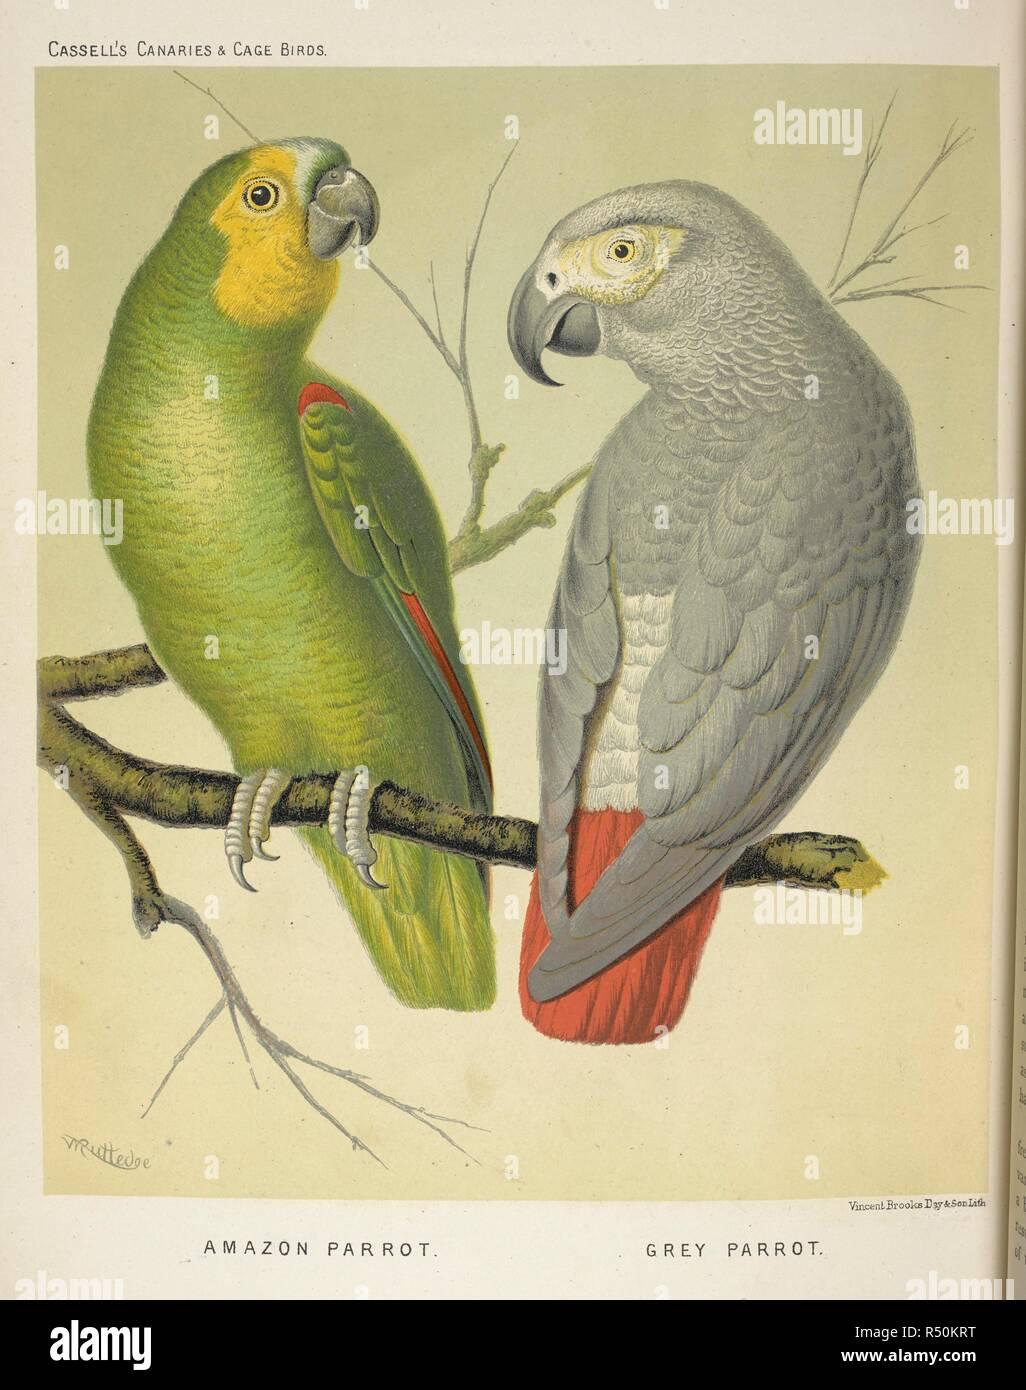 Illustrated Book Canaries Cage Birds British Stockfotos